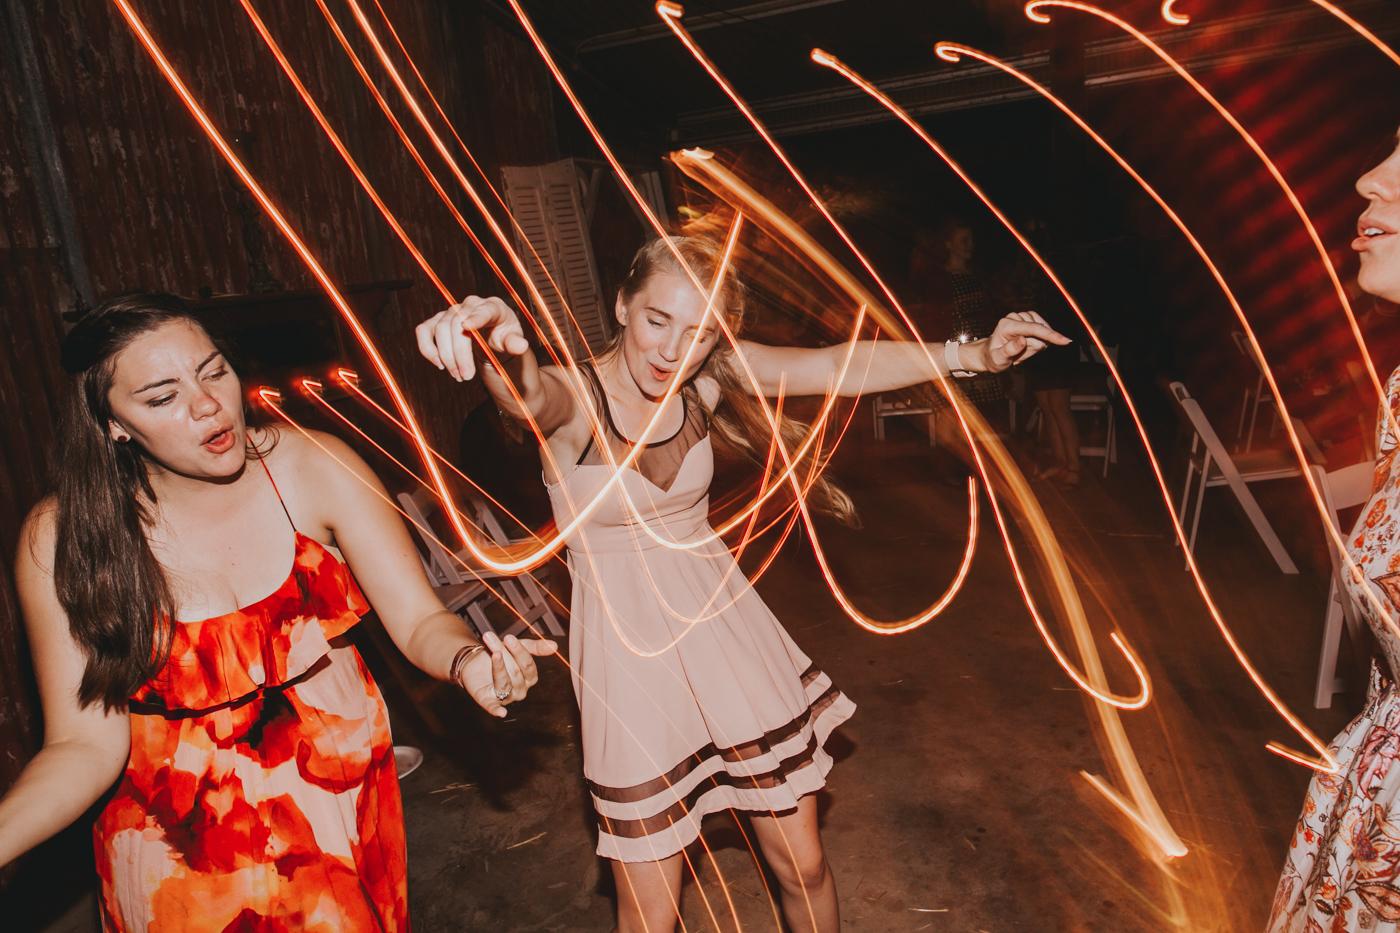 Rachel & Jacob - Willow Farm Berry - South Coast Wedding - Samantha Heather Photography-213.jpg